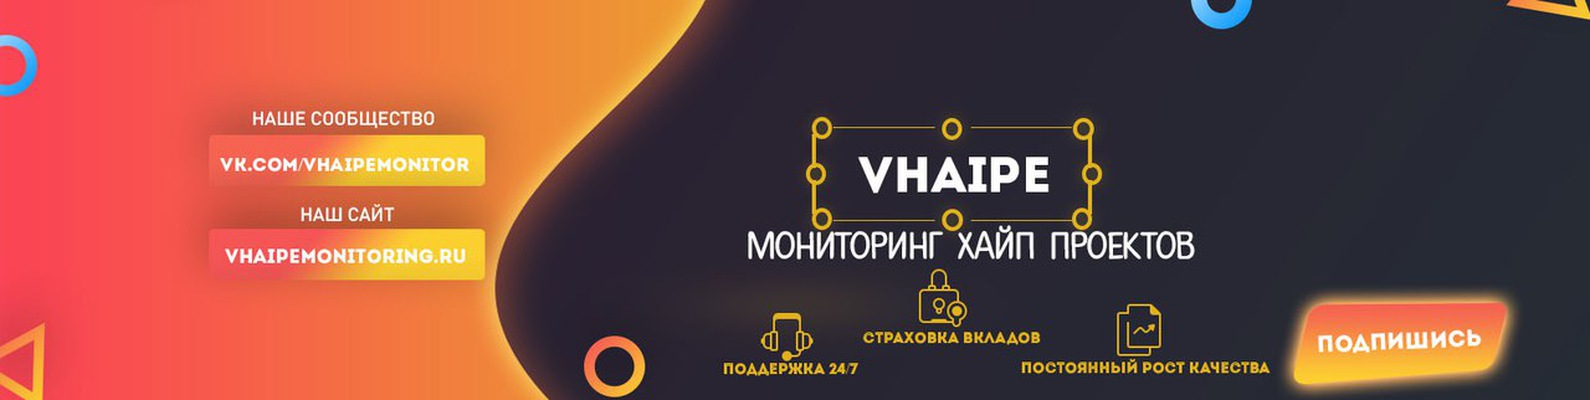 Мониторинг хайп проектов 2018 южно сахалинск